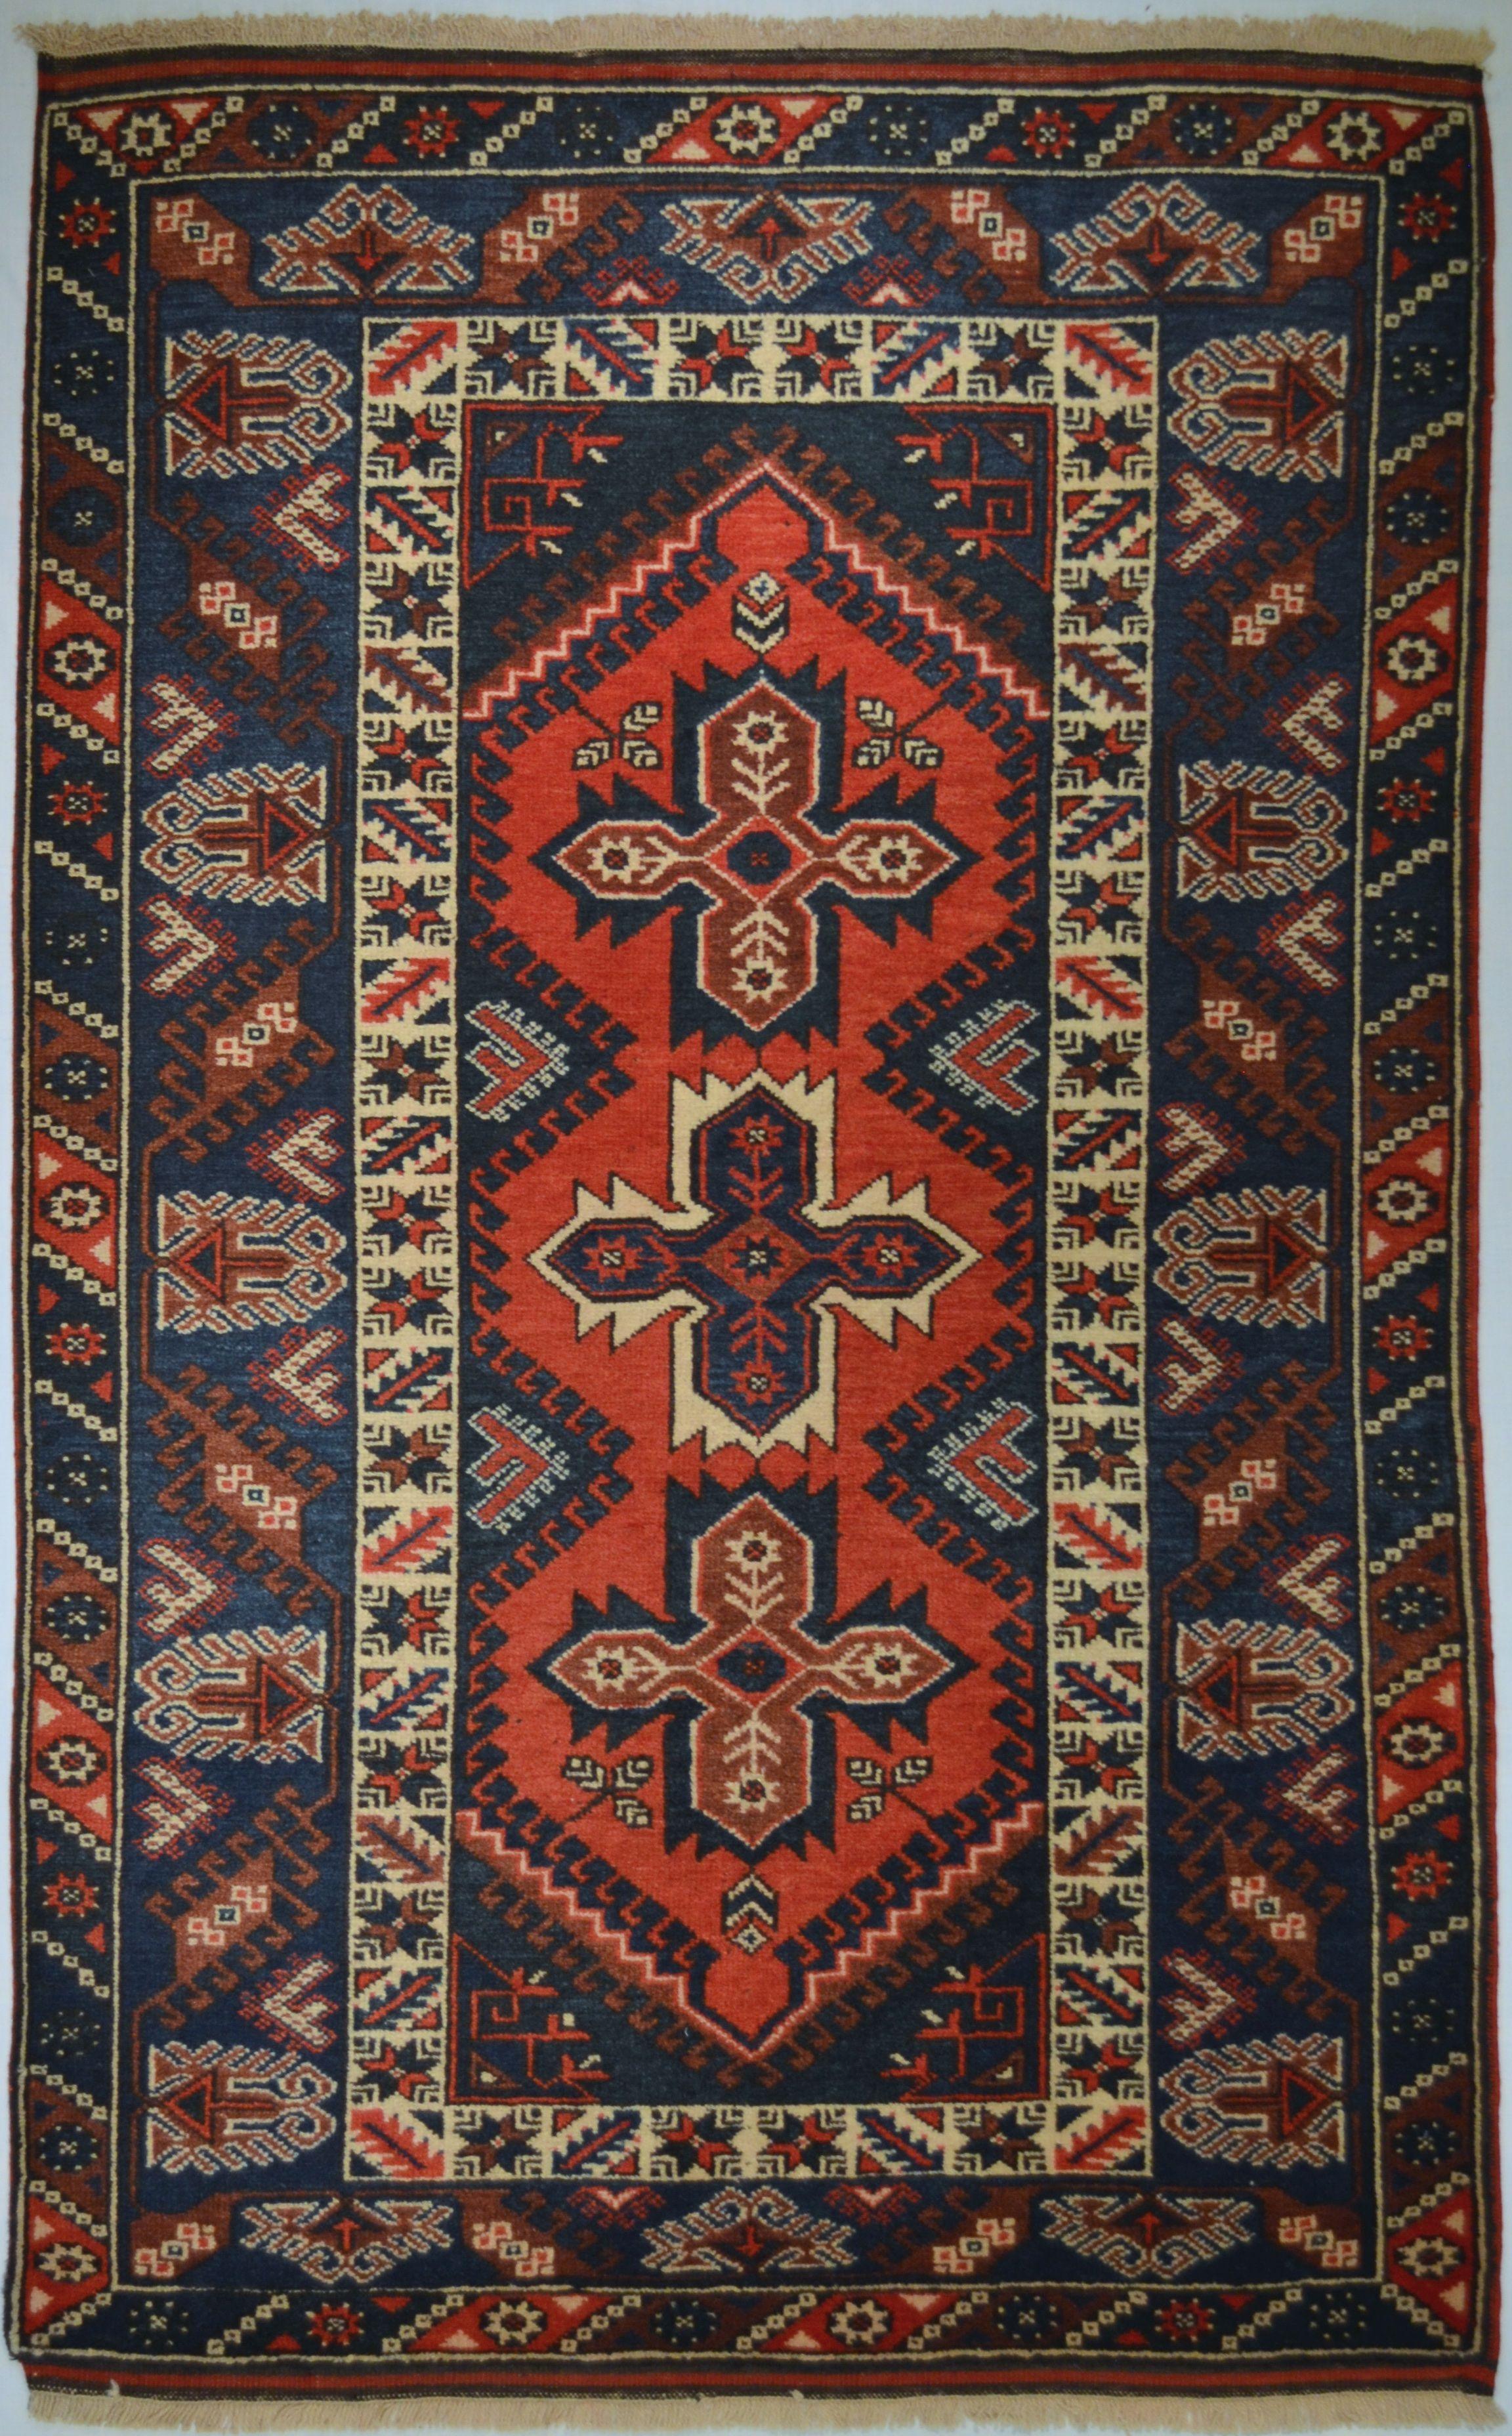 Dusemealti Rug Chicago Rugs Kilims Rugs Simple Carpets Carpet Shops